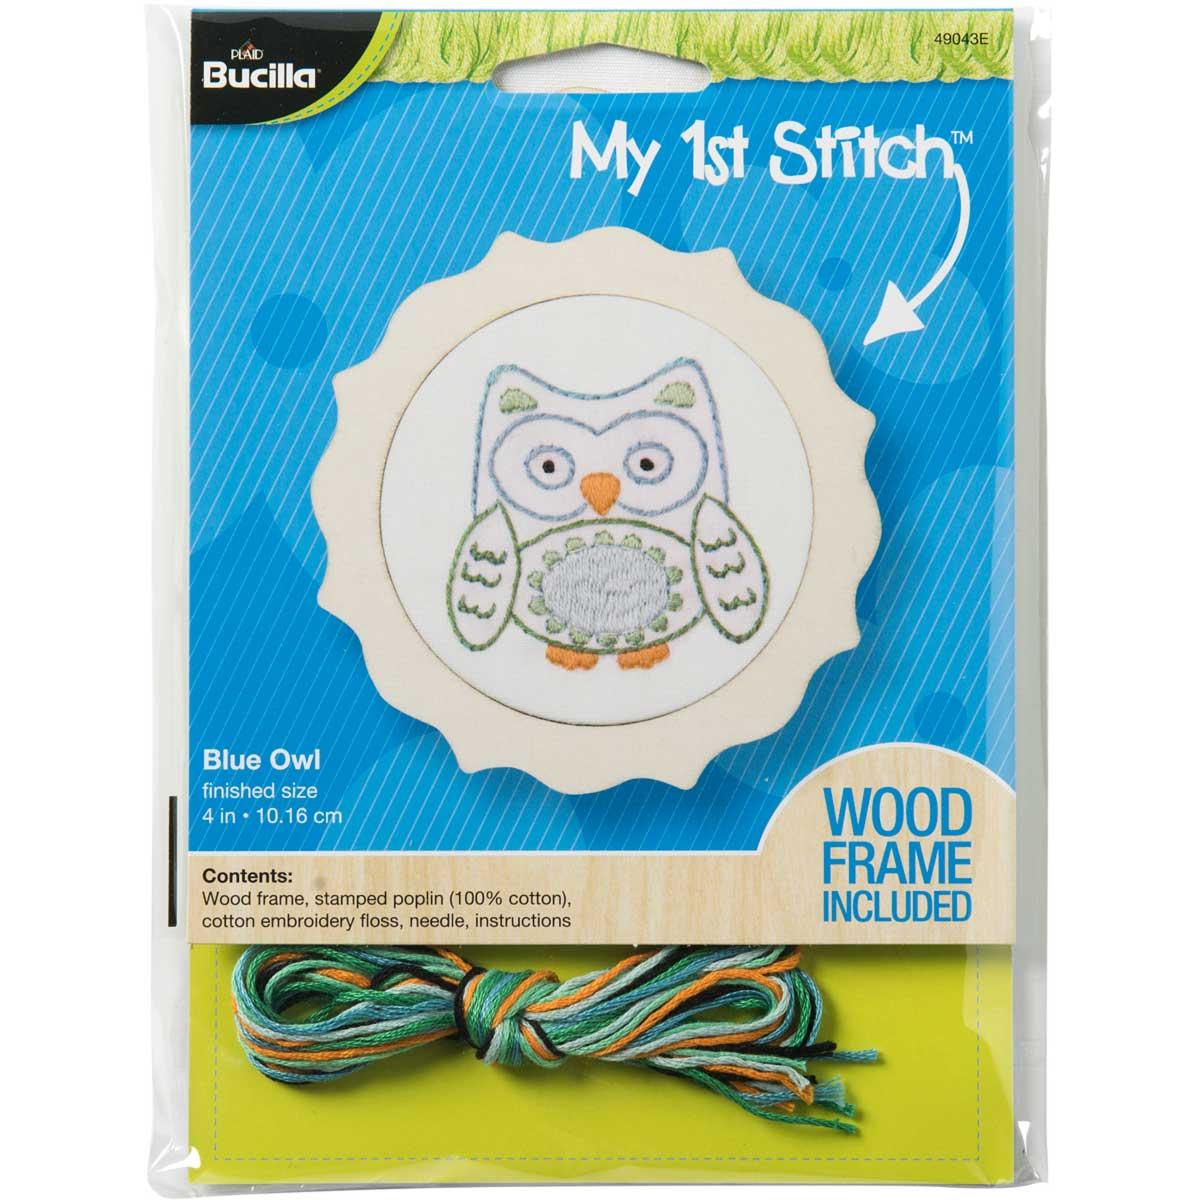 Bucilla ® My 1st Stitch™ - Stamped Embroidery Kits - Blue Owl - 49043E